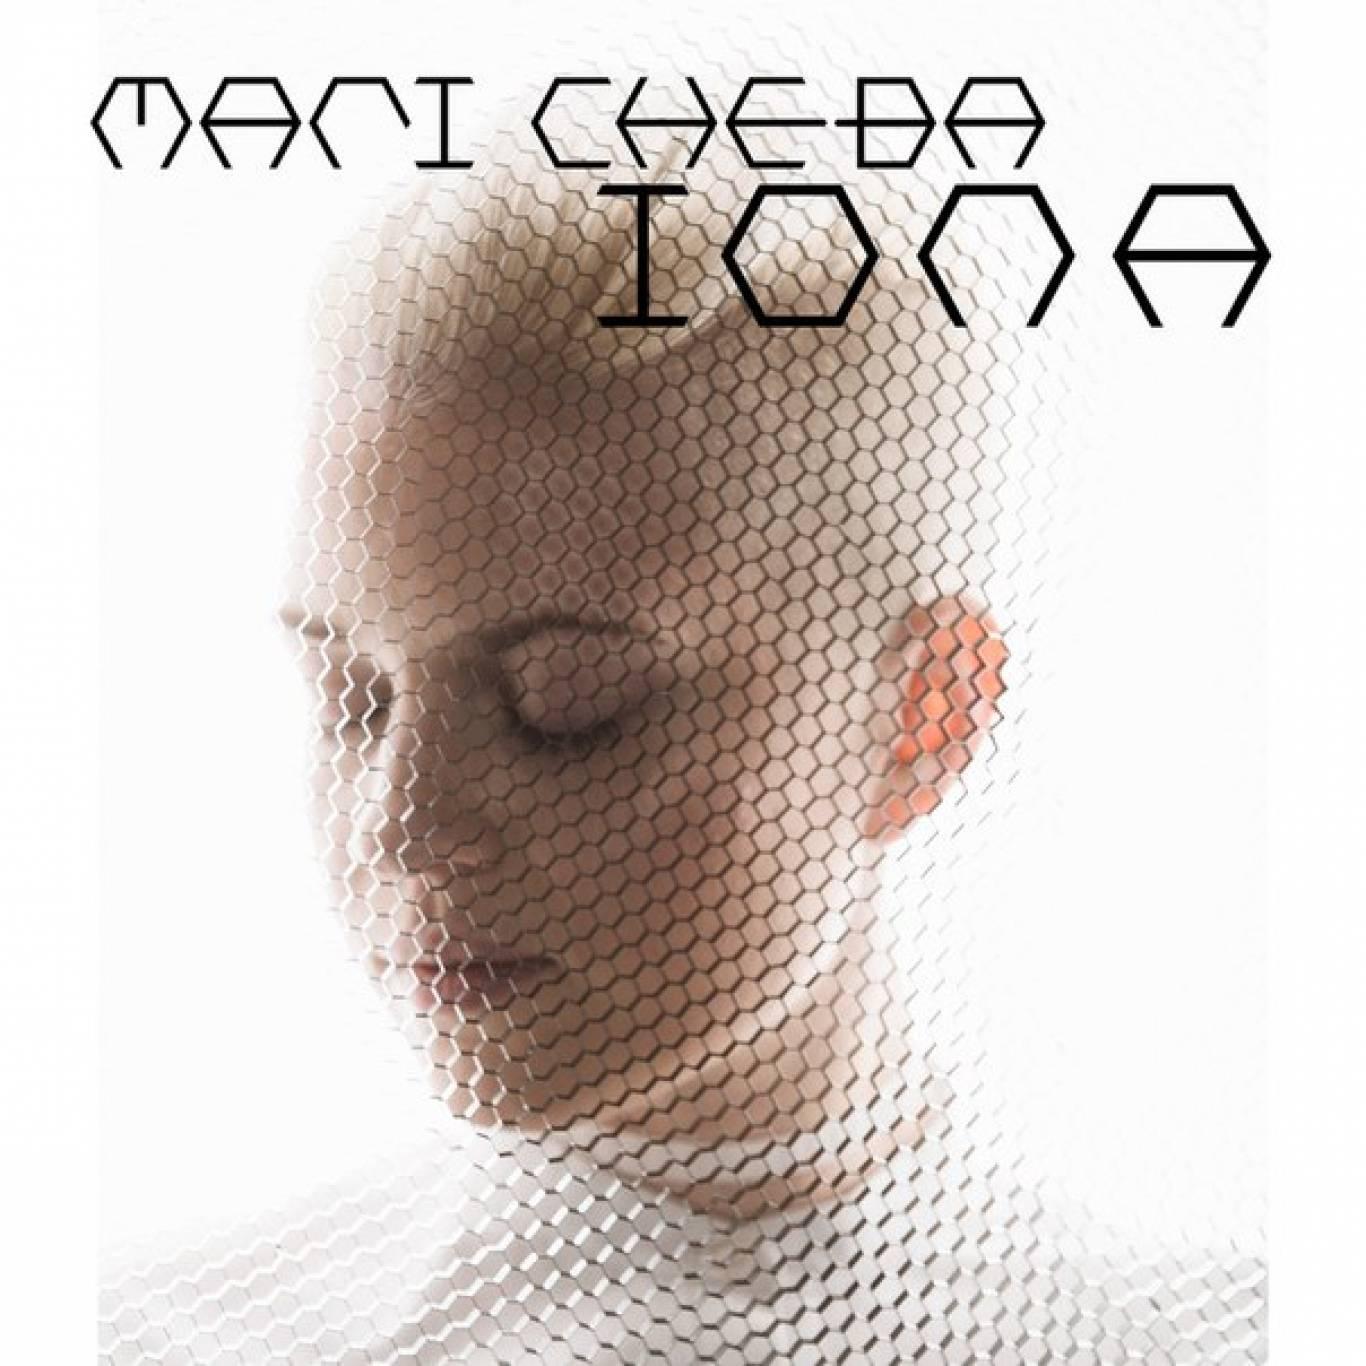 Гурт Mari Cheba презентує альбом IONA